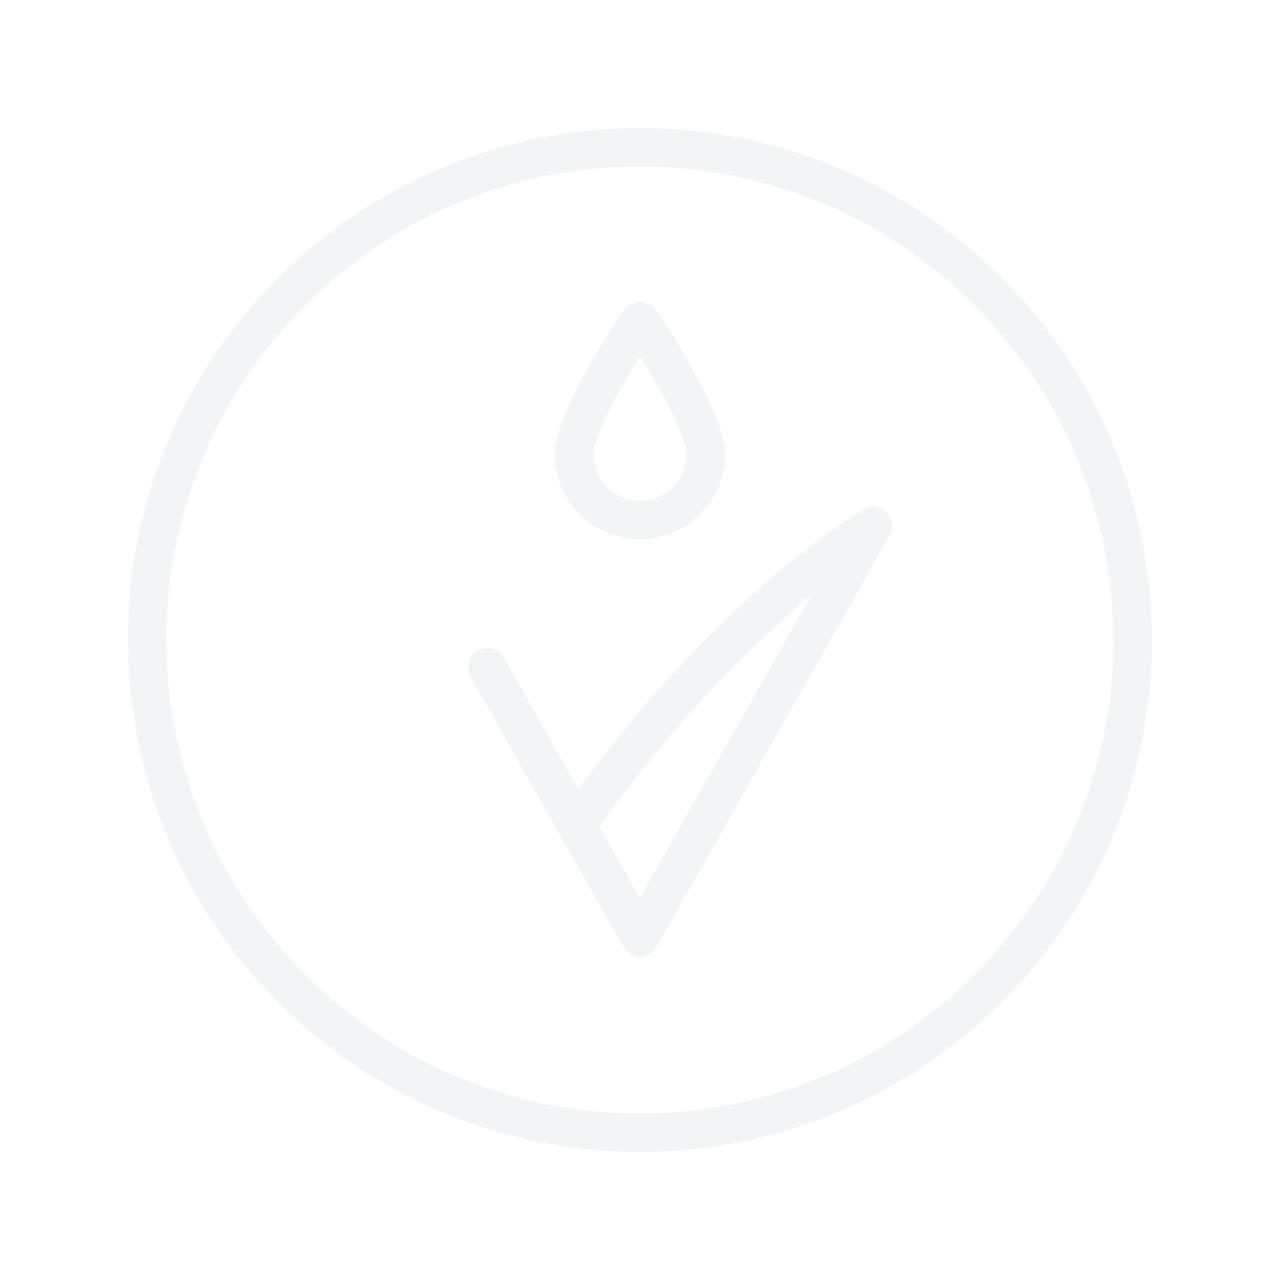 FOAMIE Shampoo Bar For Dry Hair 83g